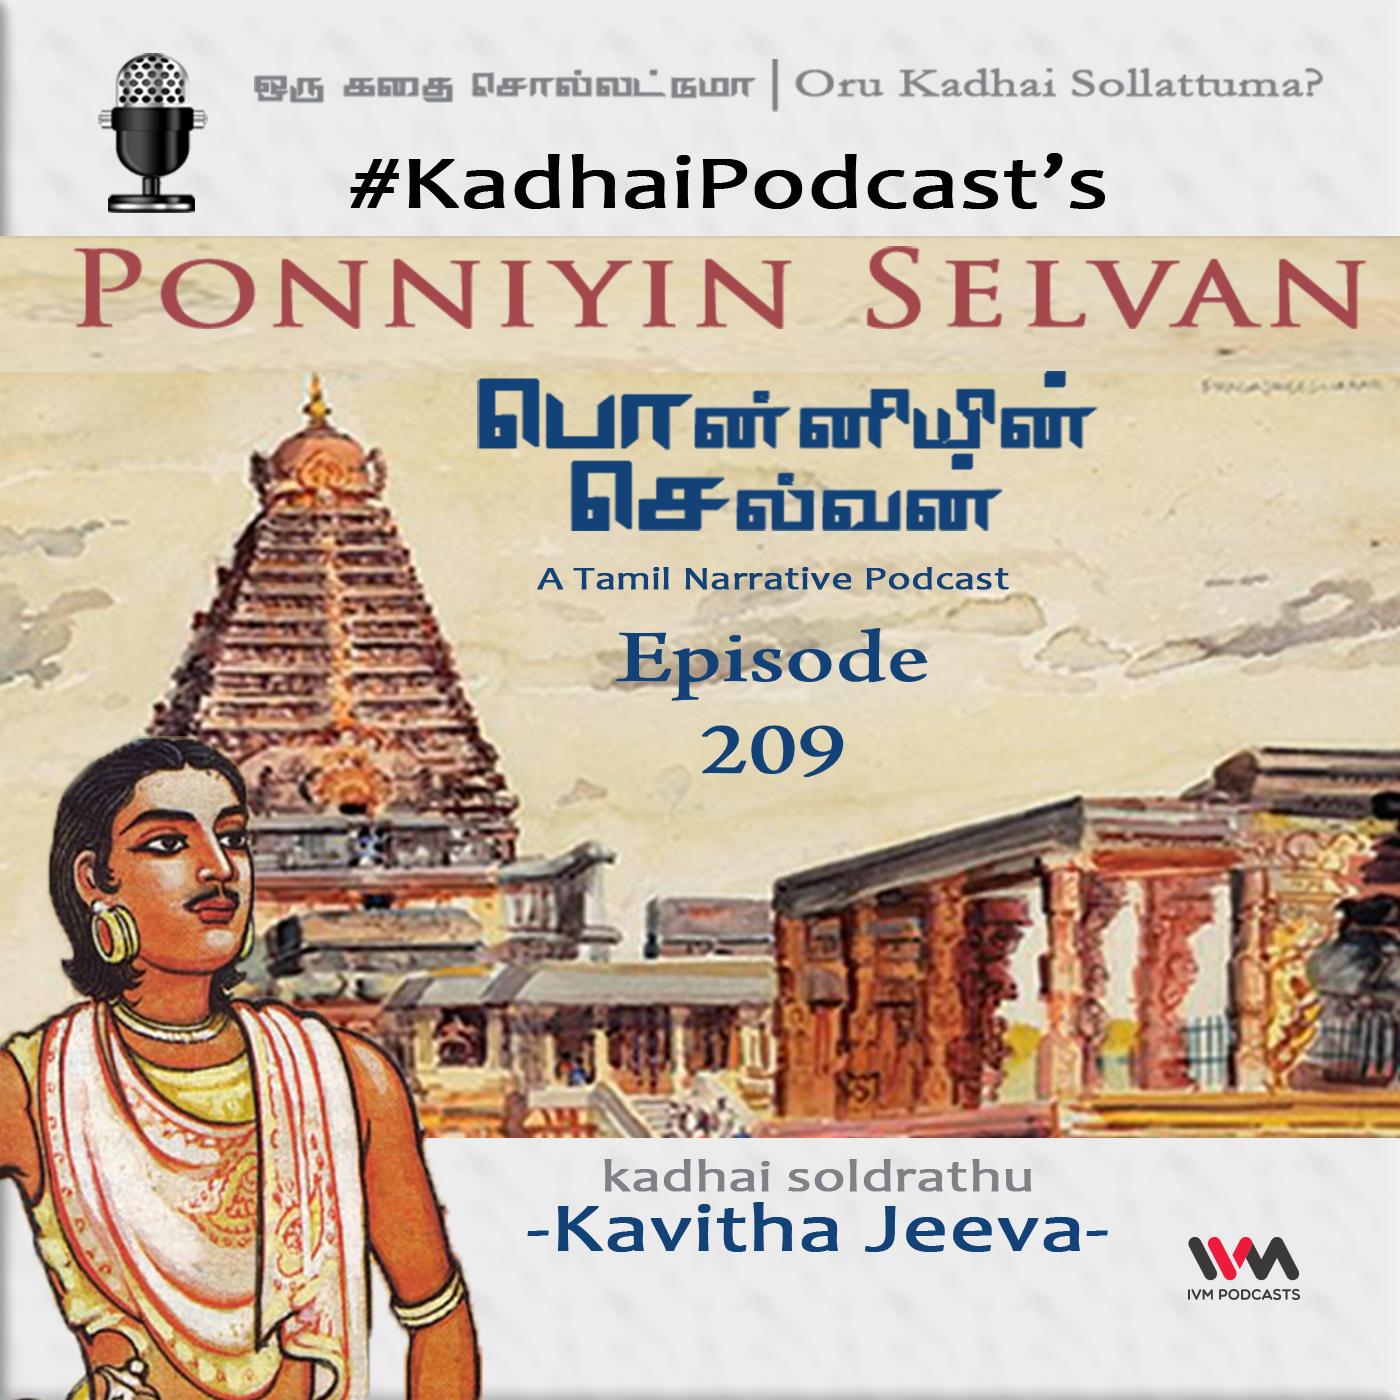 KadhaiPodcast's Ponniyin Selvan - Episode # 209